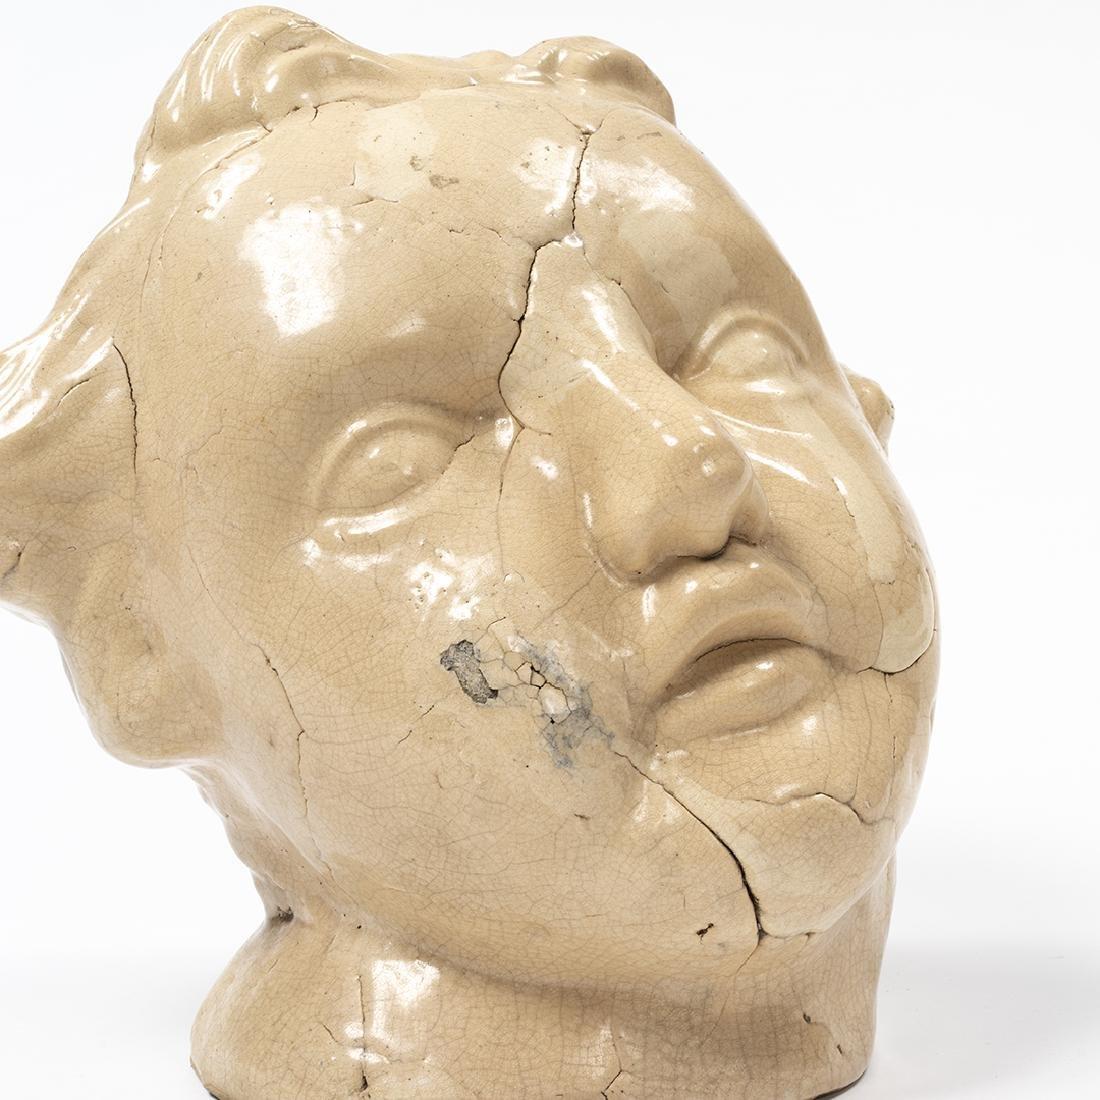 Large Porcelain Cherub Head - 5